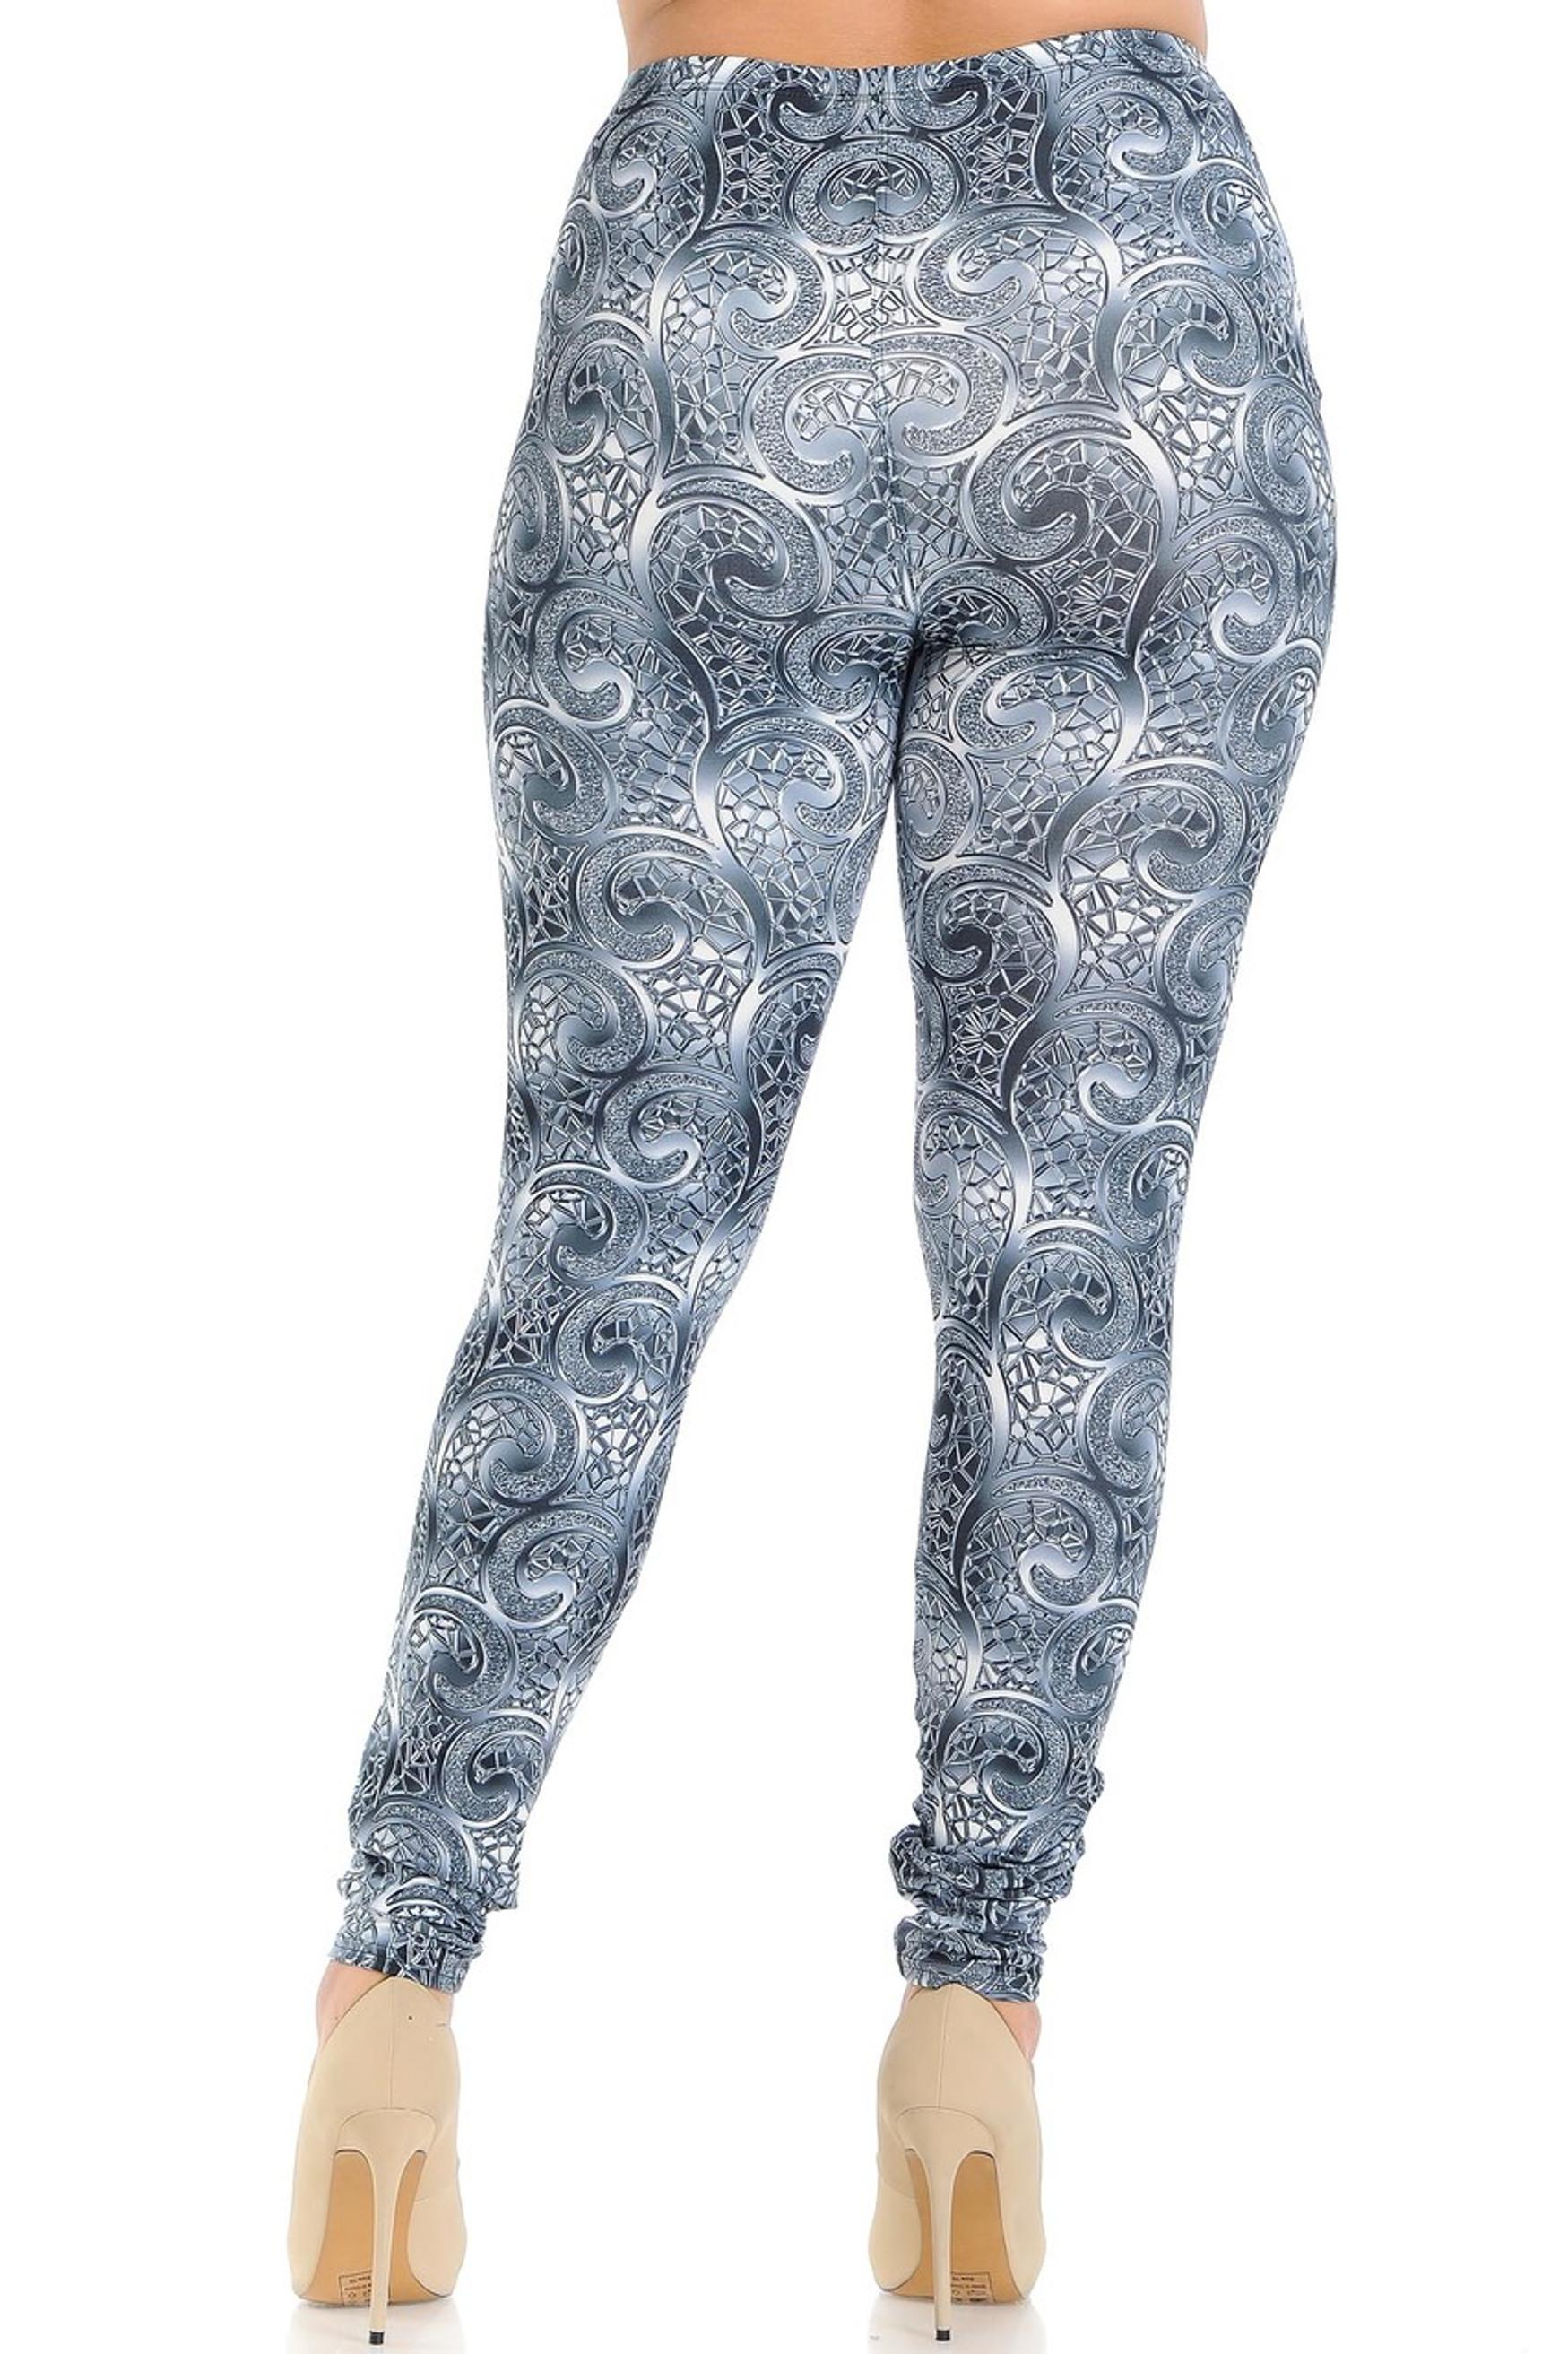 Creamy Soft Swirling Crystal Glass Extra Plus Size Leggings - 3X-5X - USA Fashion™